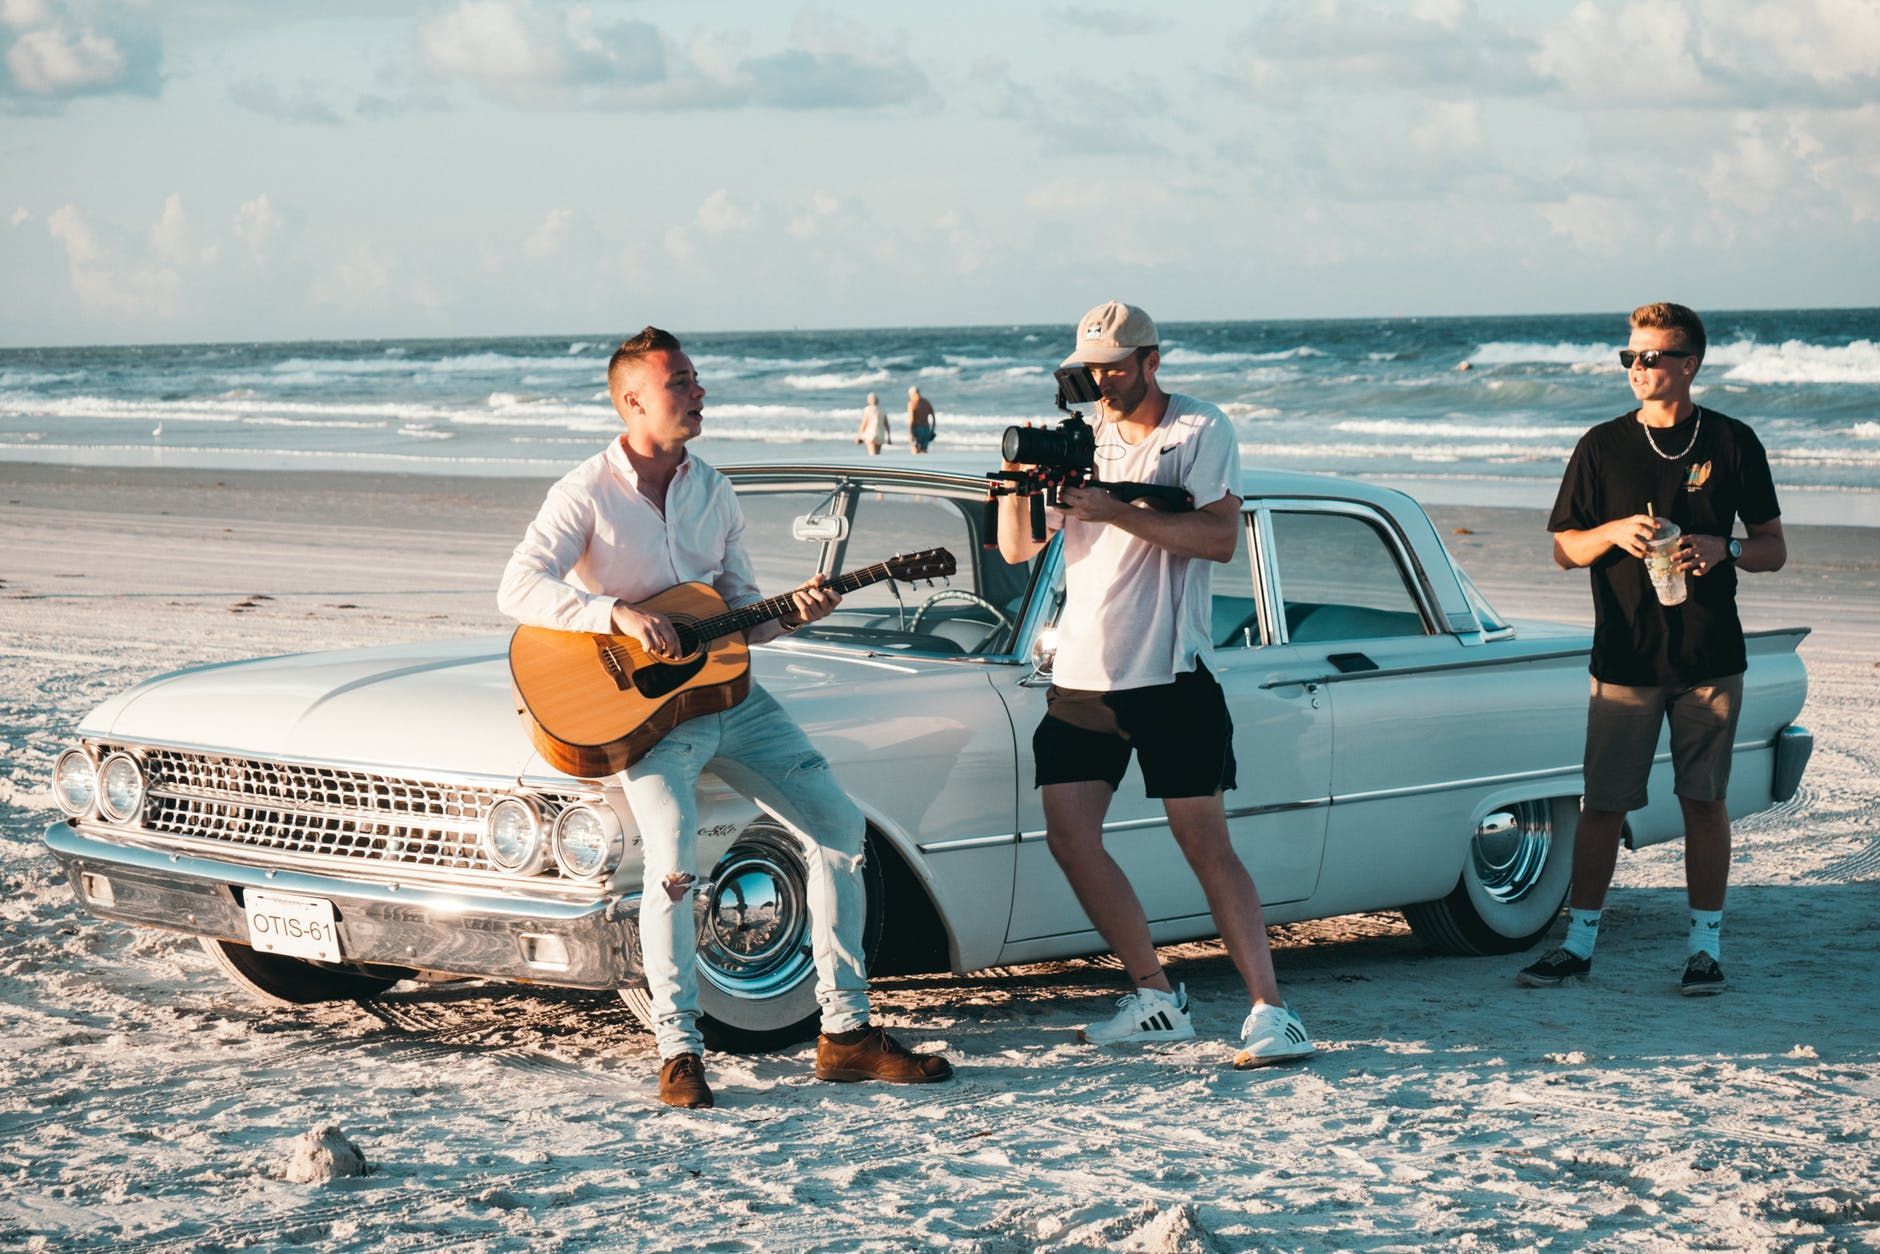 Músico grava vídeo tocando violão na praia